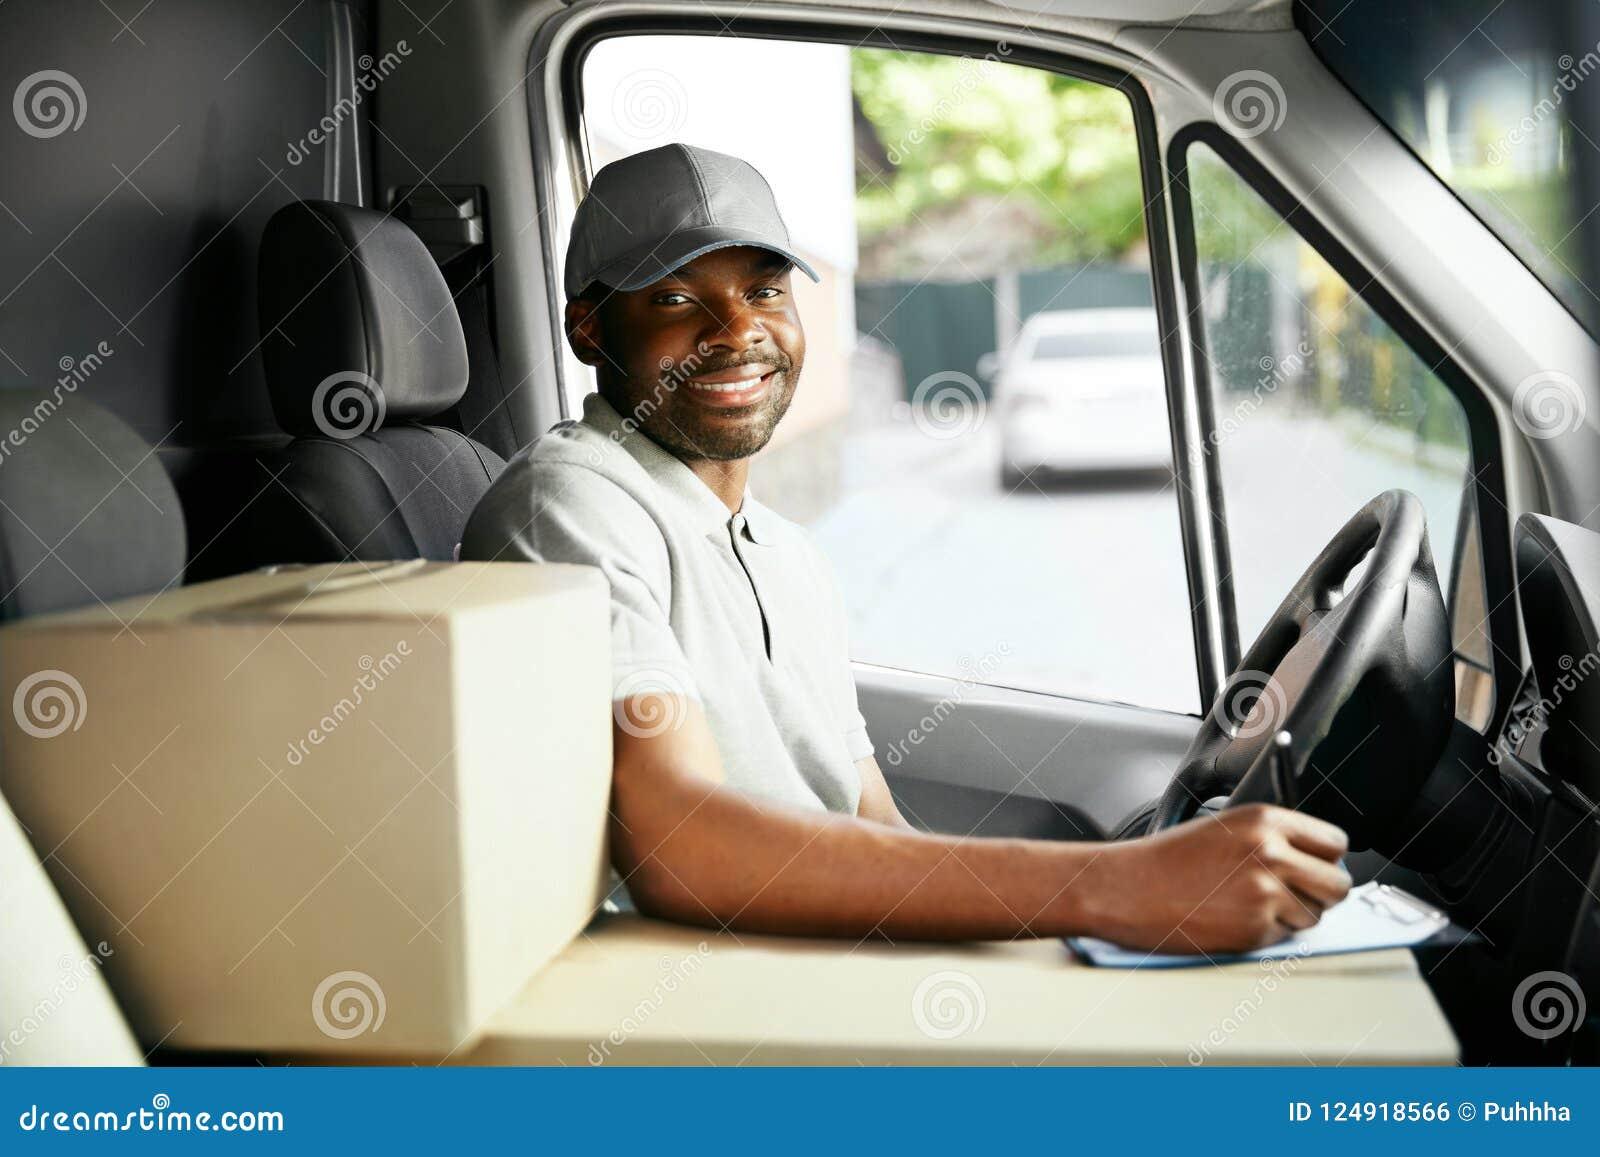 Koerier Delivery Zwarte Mensenbestuurder Driving Delivery Car